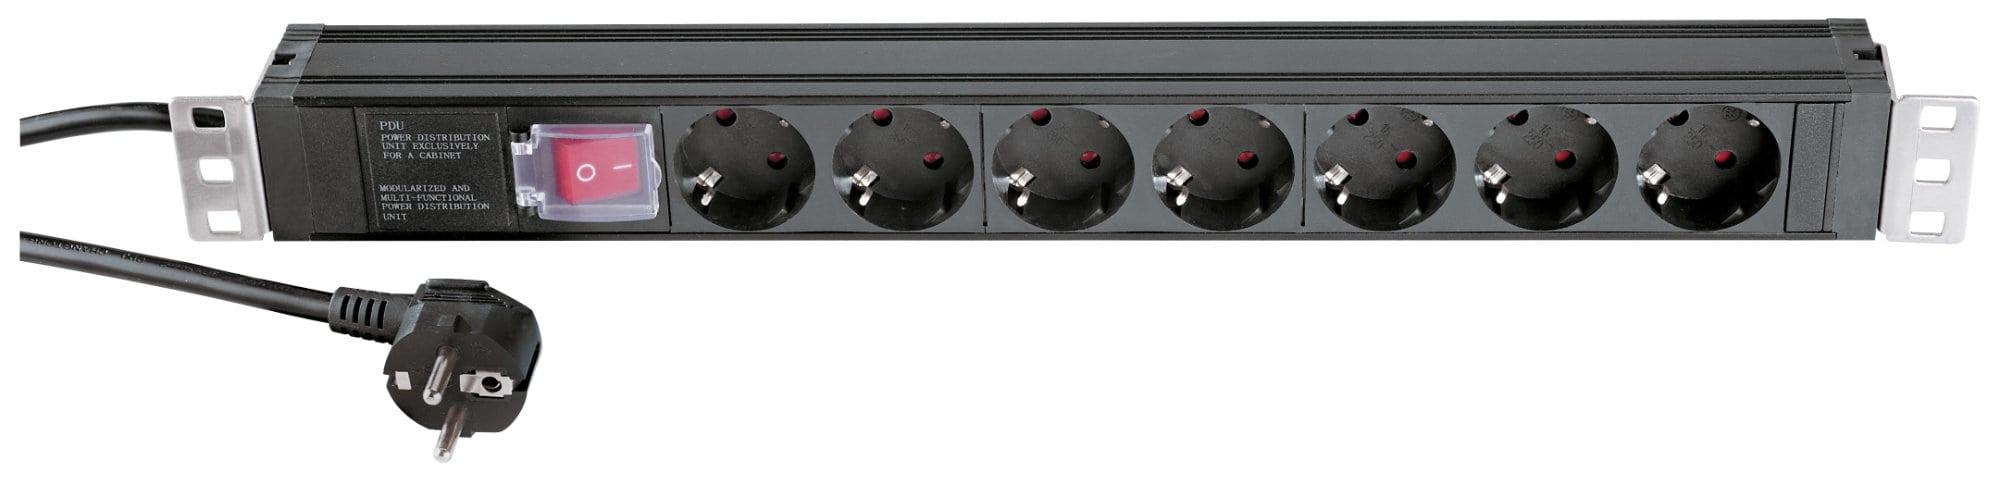 Studiozubehoer - K M 28674 19 Power Box - Onlineshop Musikhaus Kirstein